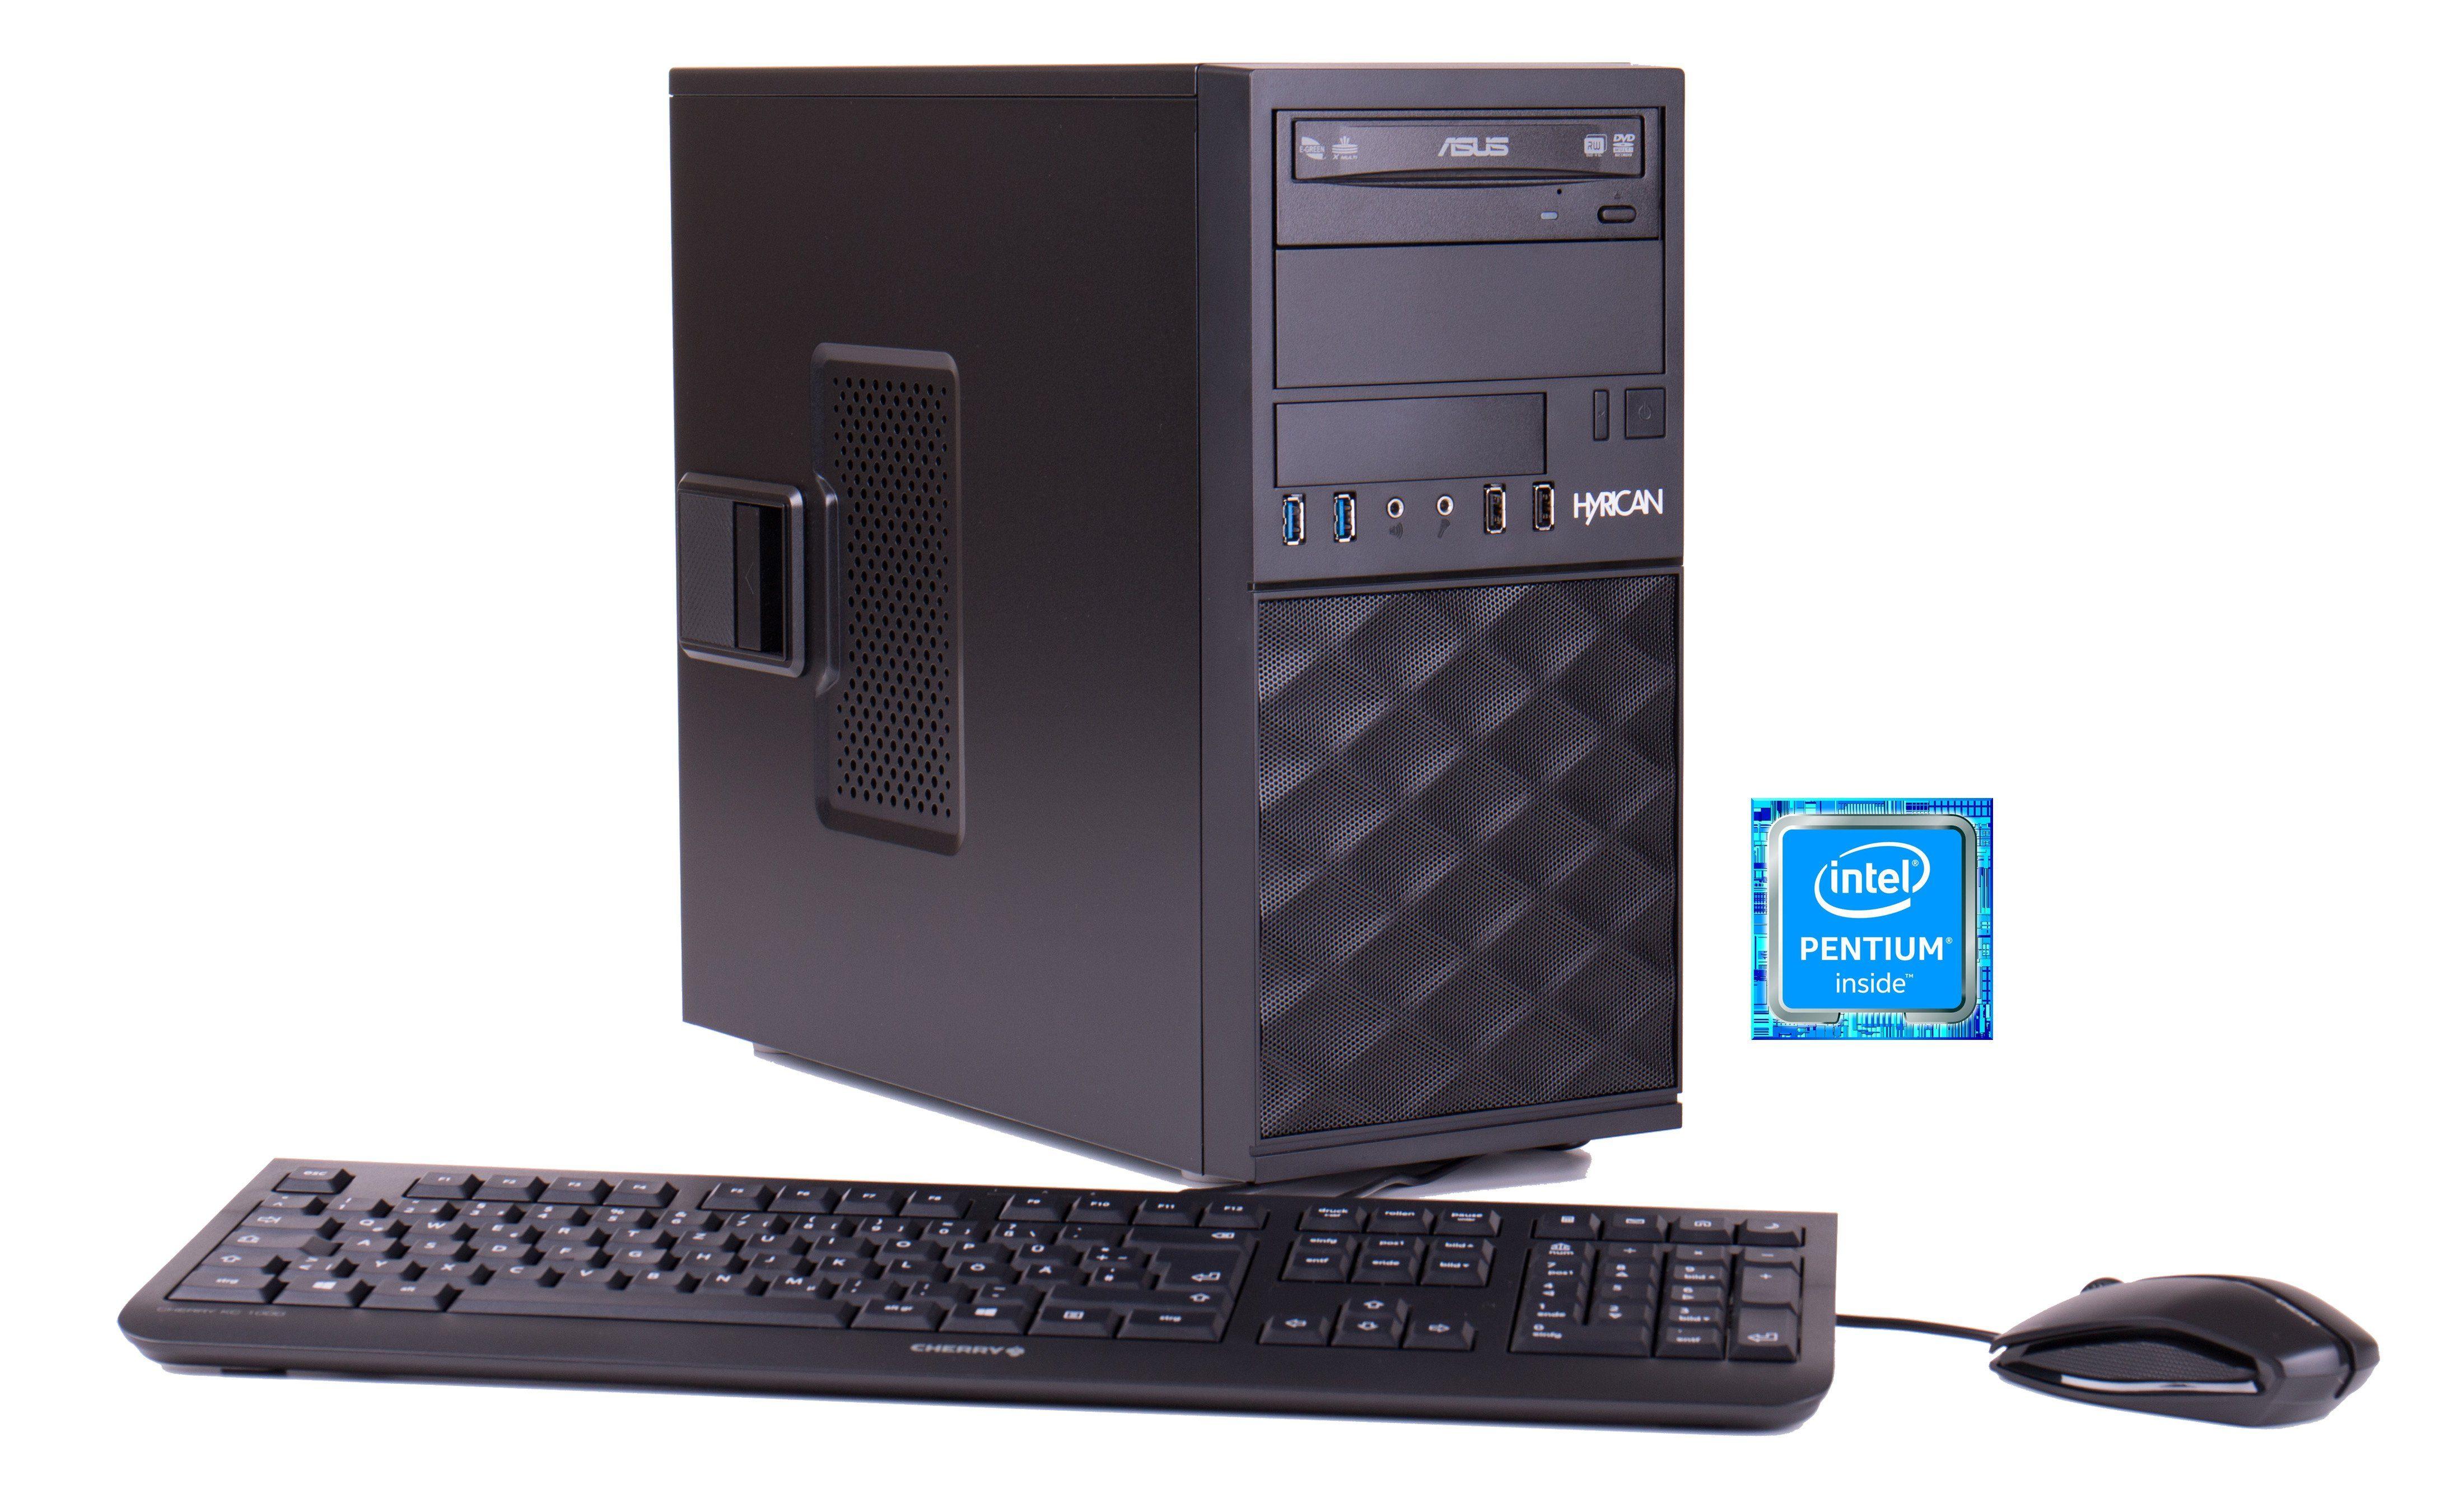 Hyrican Business PC Intel® G4600, 4GB, 120GB, Windows 10 Pro Lizenz »Business CTS00391«